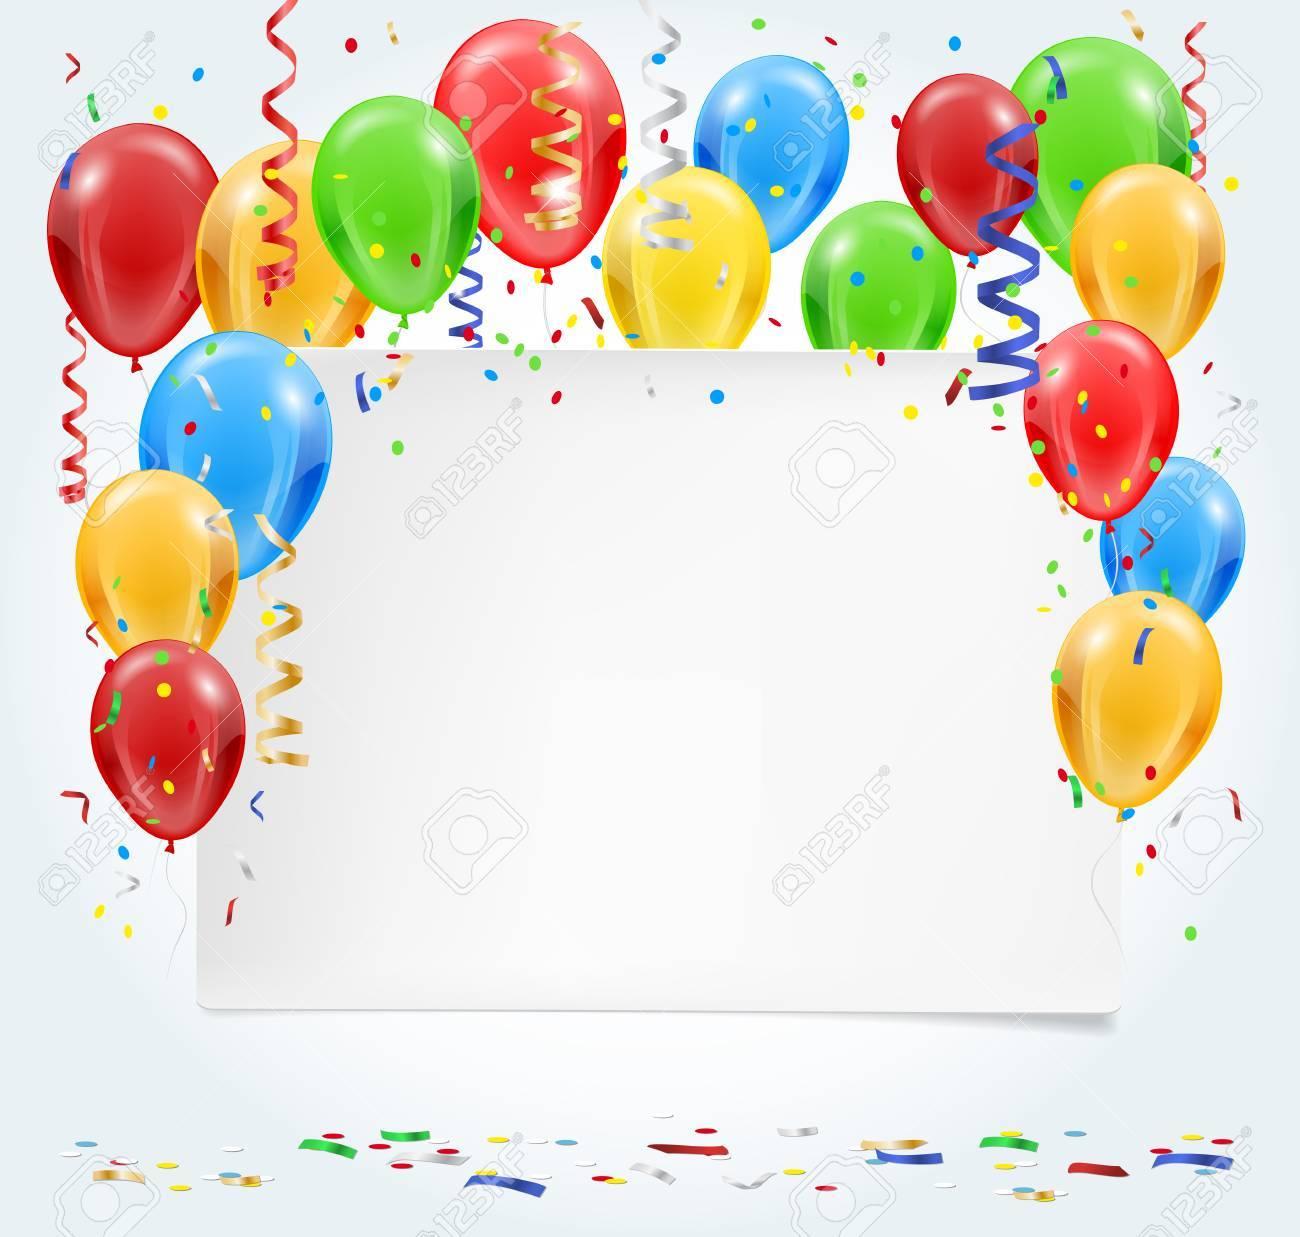 Paper invitation inflatable balloons confetti party background paper invitation inflatable balloons confetti party background with place for your text stopboris Choice Image